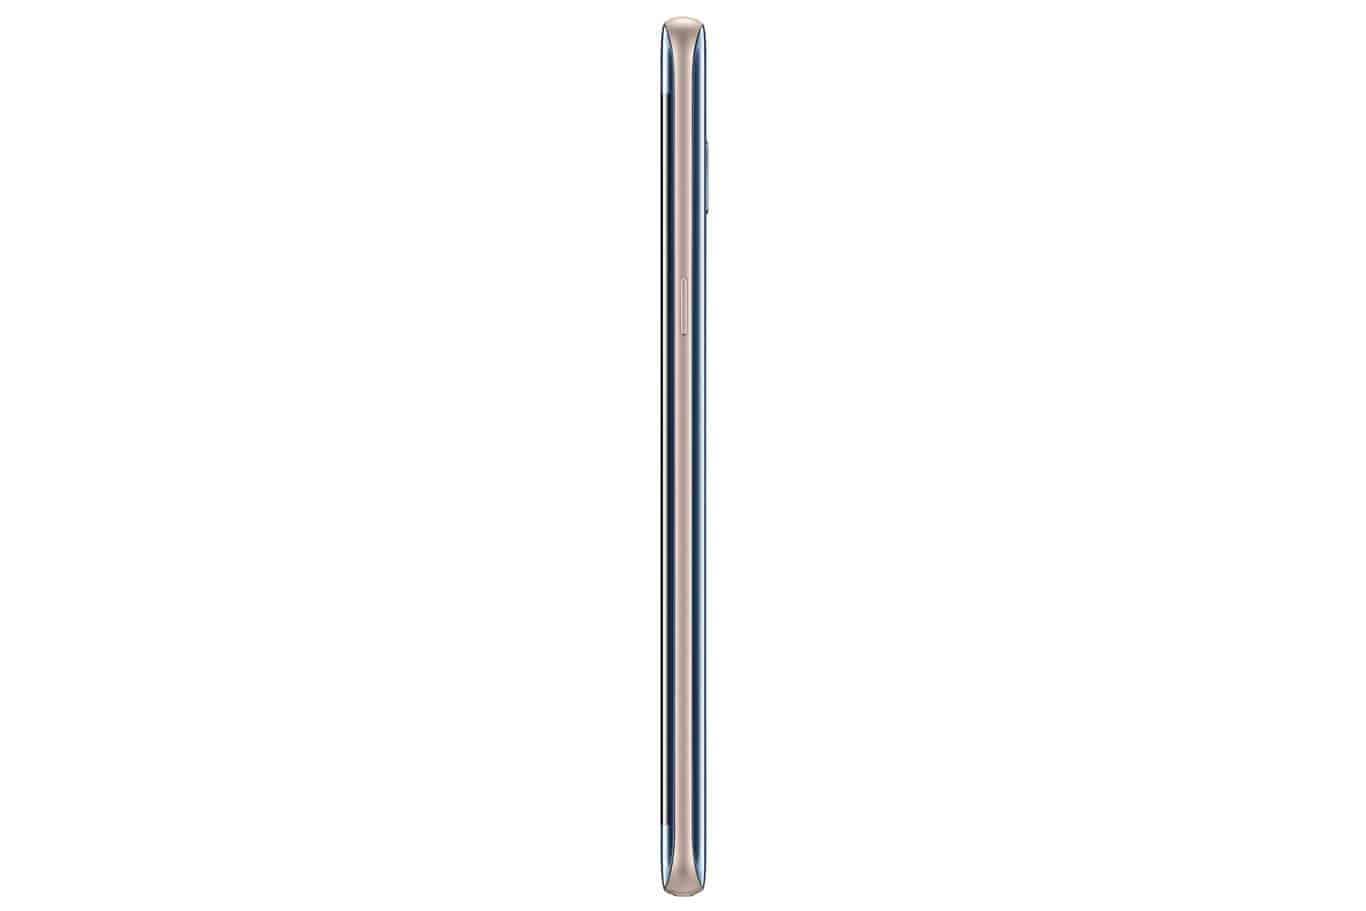 Samsung Galaxy Note 7 AH 16